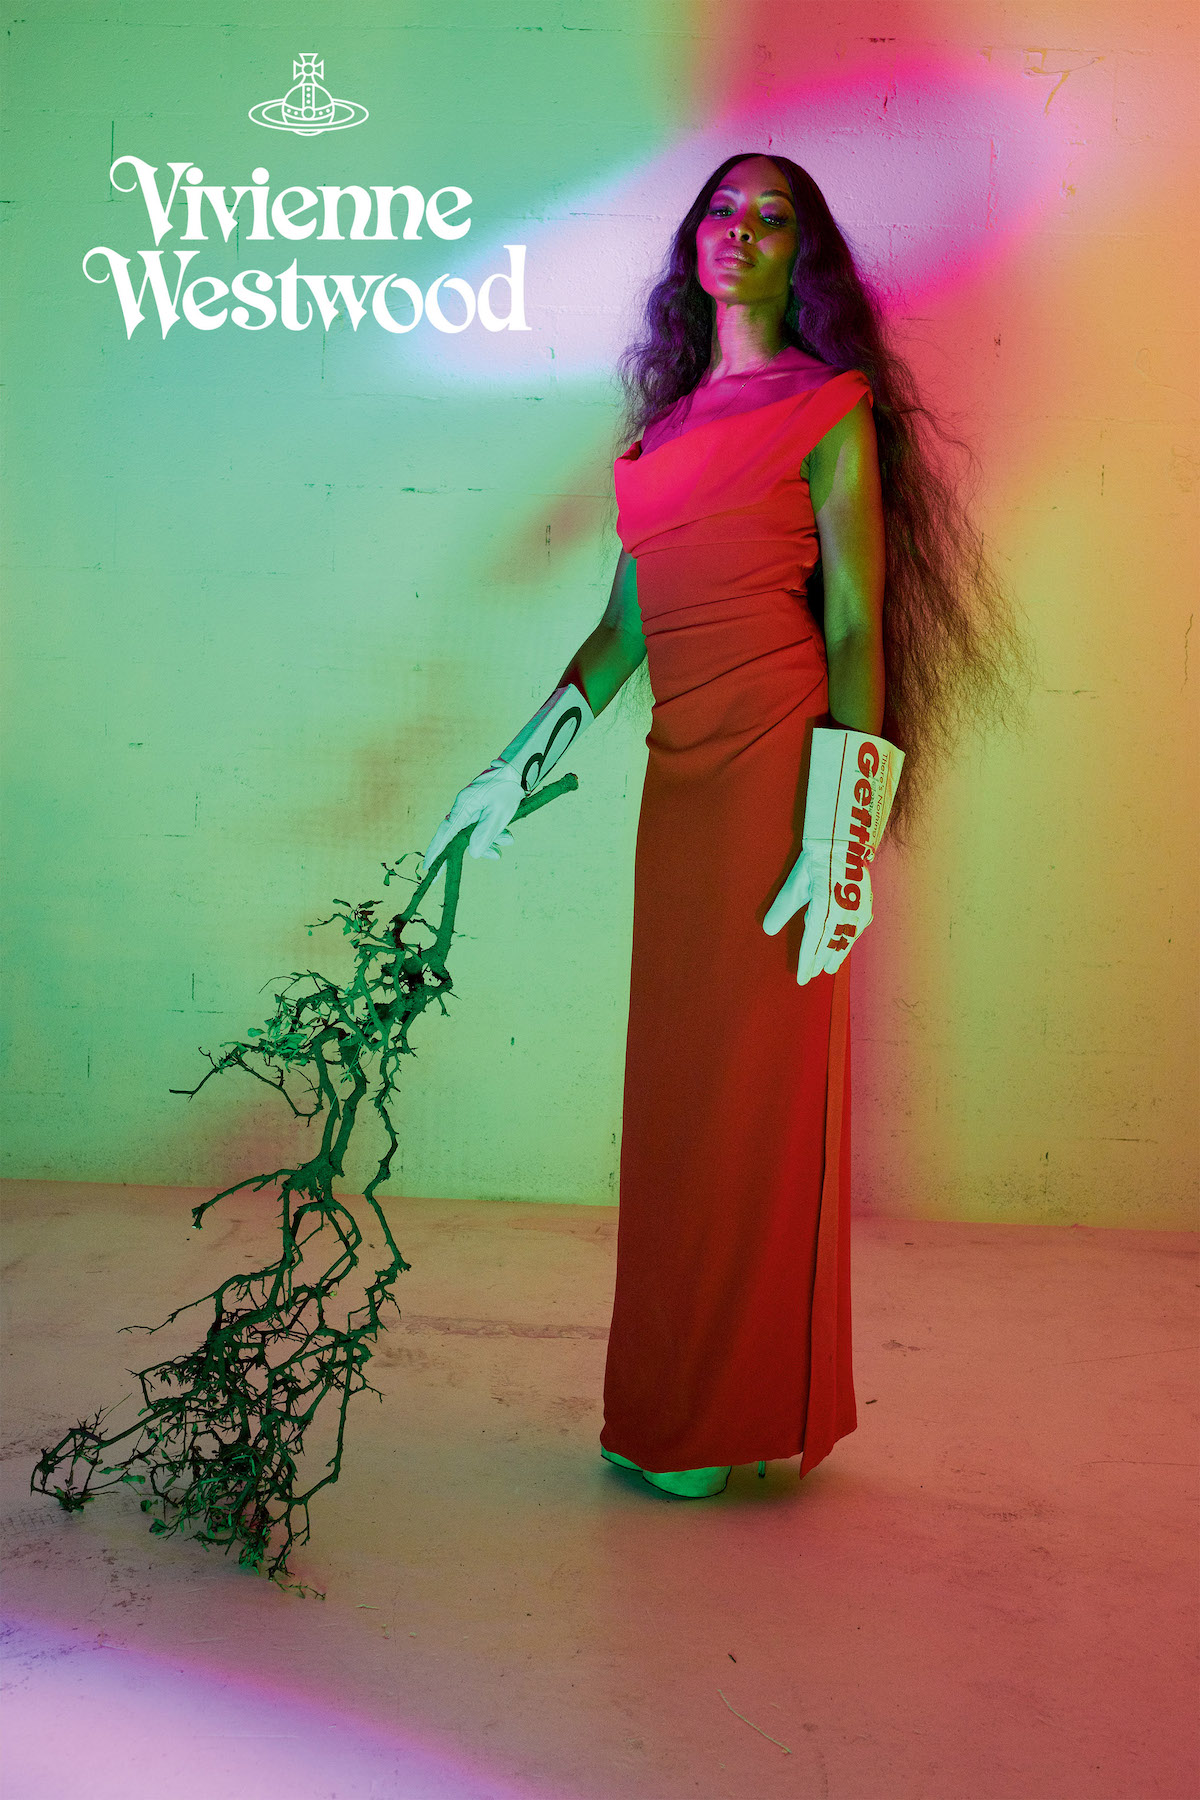 Colección Vivienne Westwood/Andreas Kronthaler SS2020. Fotografía: Juergen Teller